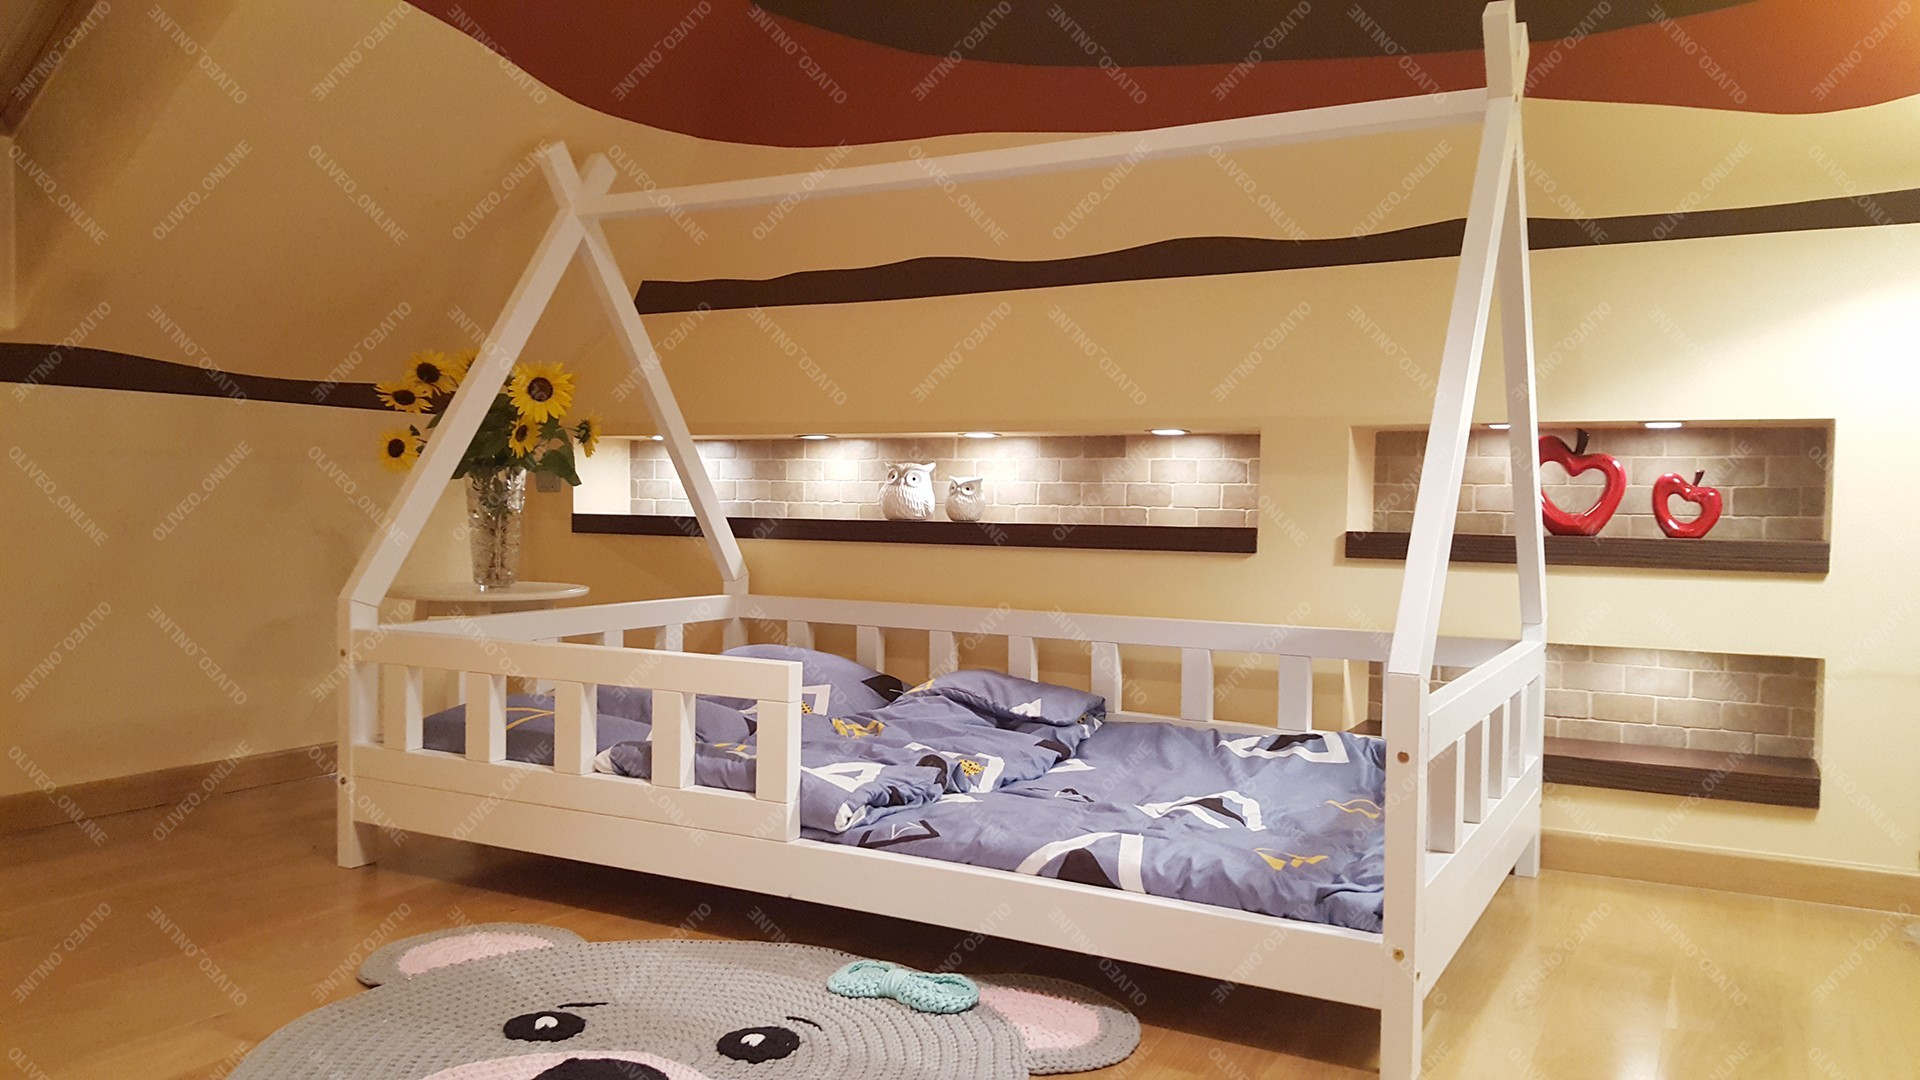 Full Size of Hausbett Kinder Bett Tipi Lila 80 160cm Hause Regal Kinderzimmer Kinderhaus Garten Regale Kinderschaukel Spielküche Konzentrationsschwäche Bei Schulkindern Wohnzimmer Hausbett Kinder